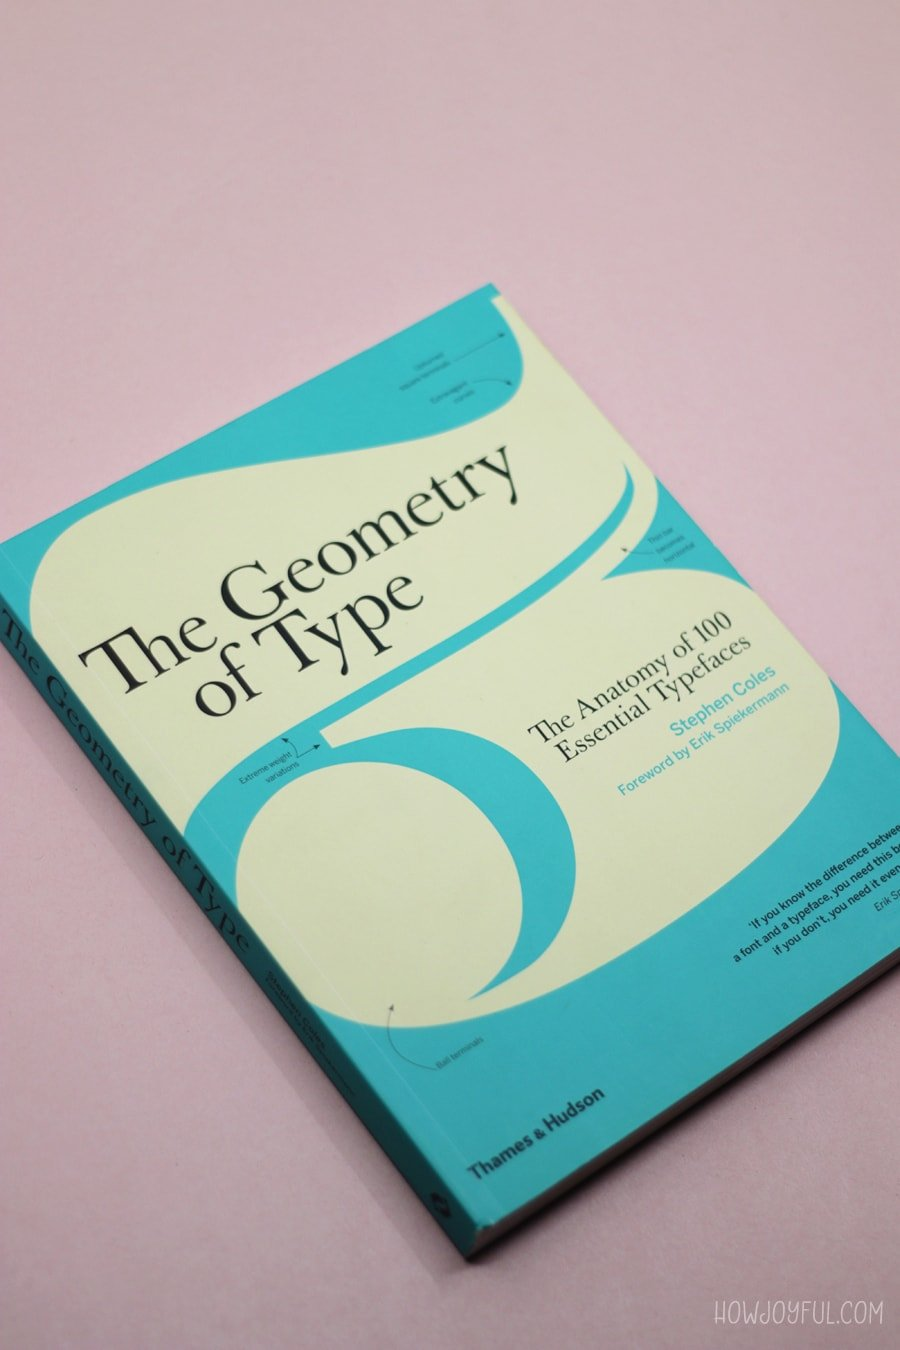 the anatomy of typefaces